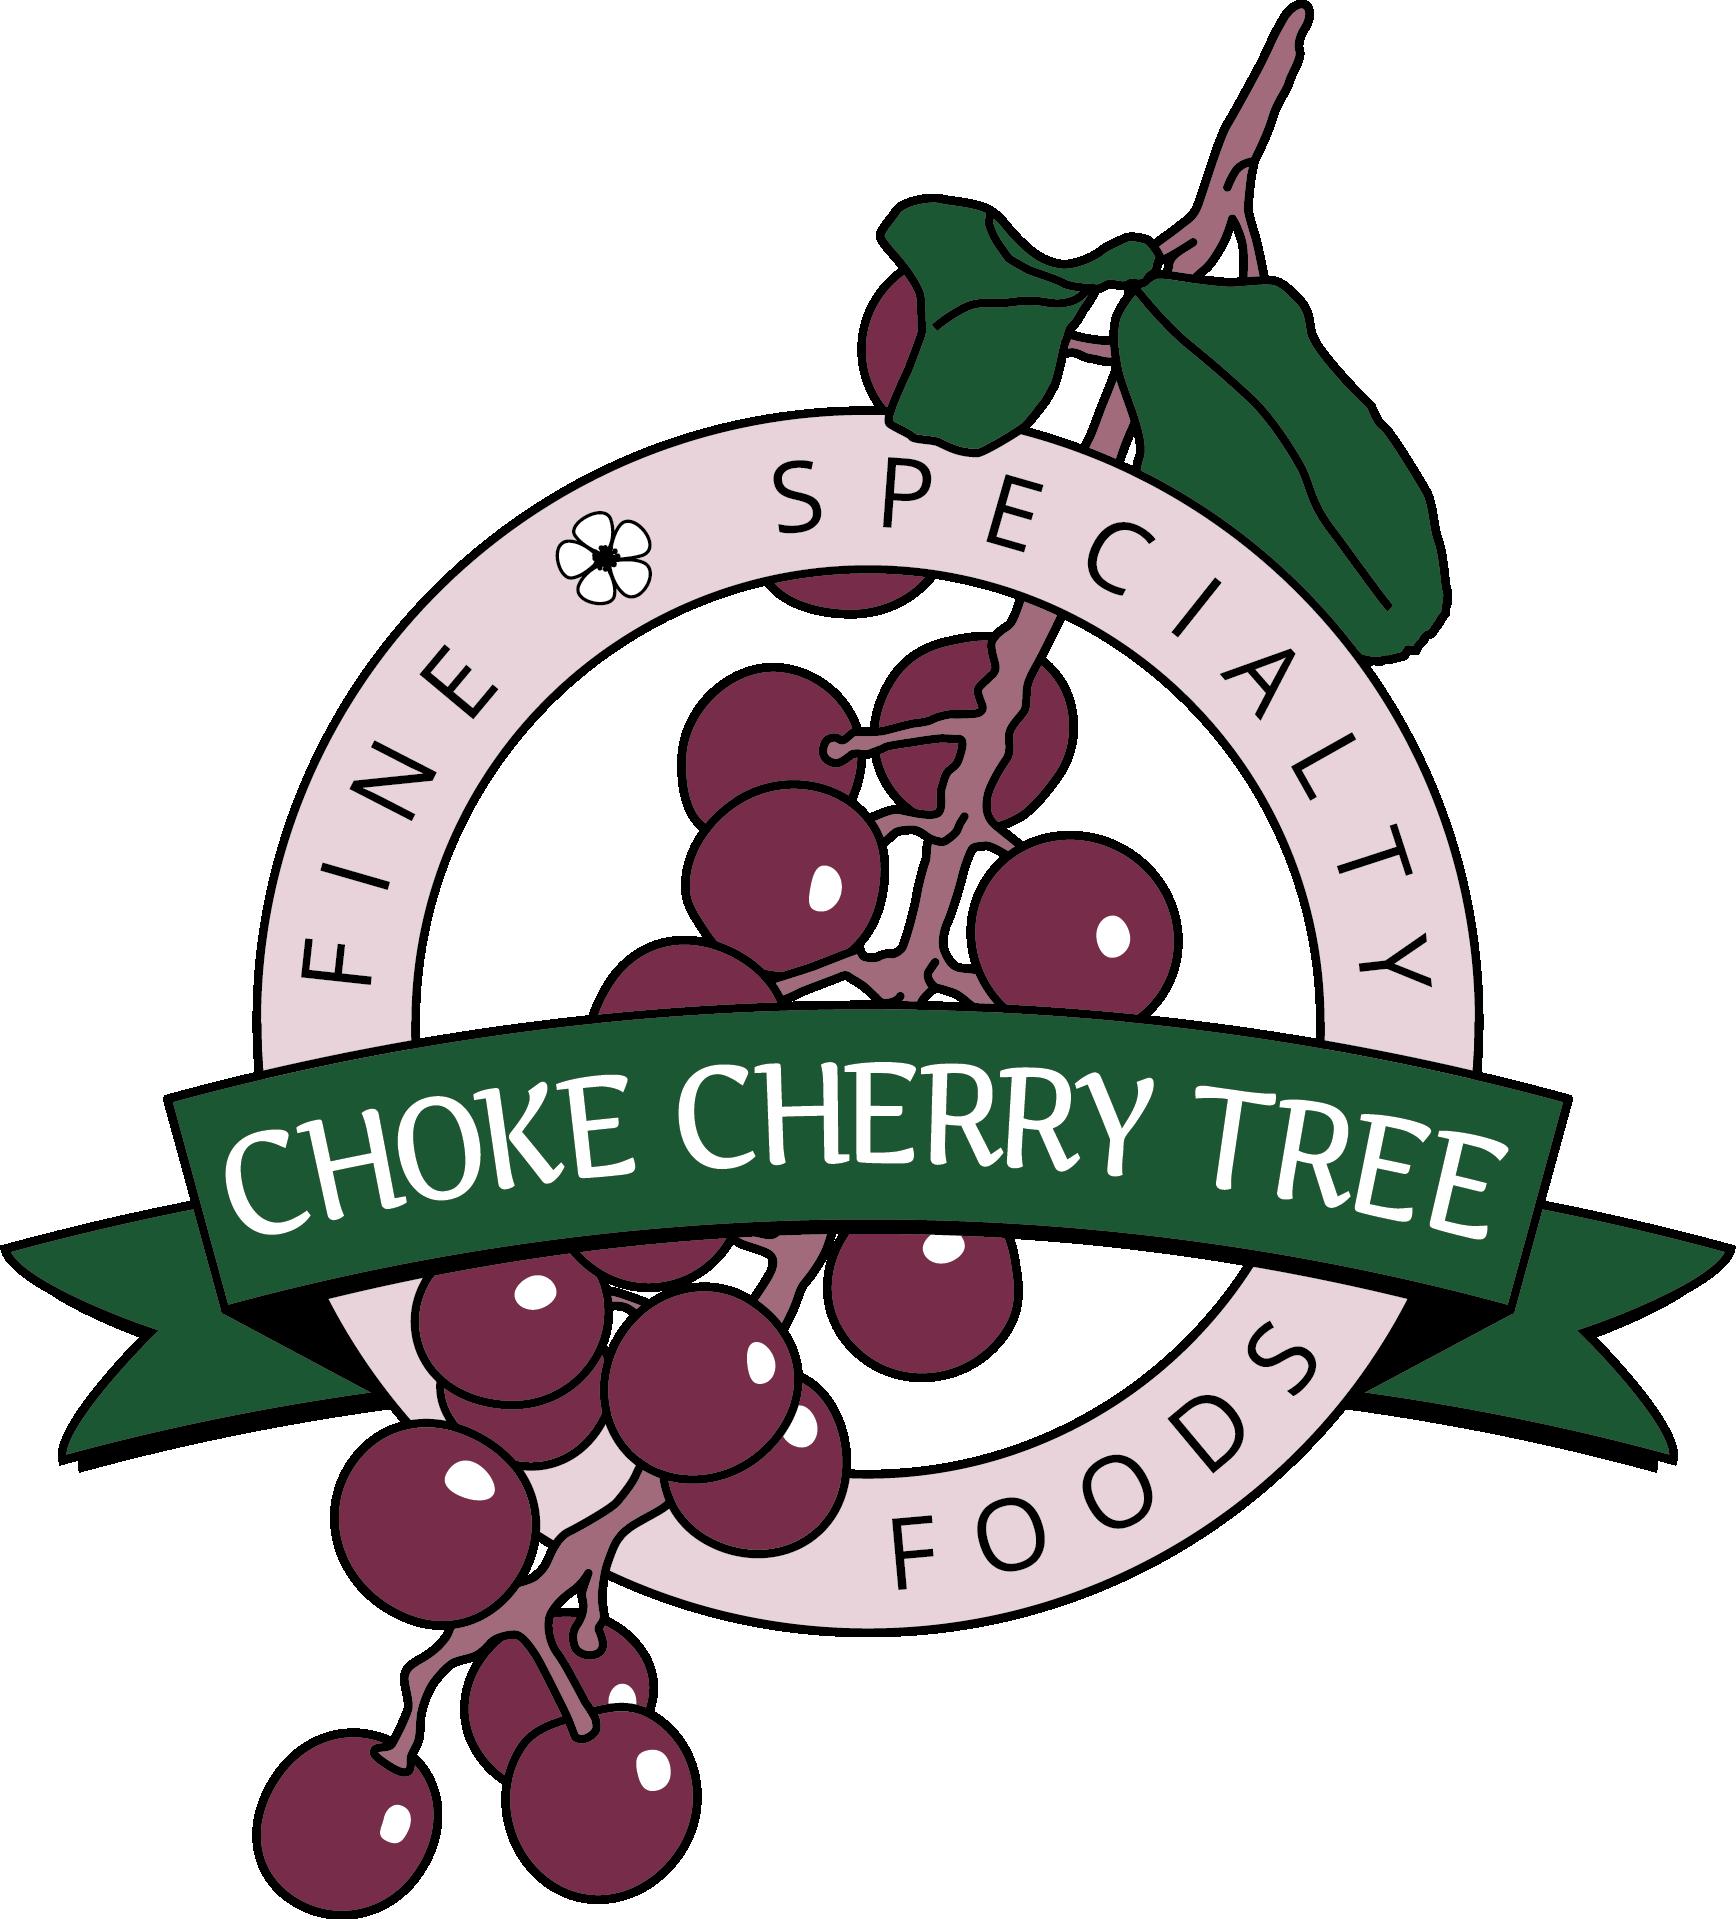 Choke Cherry